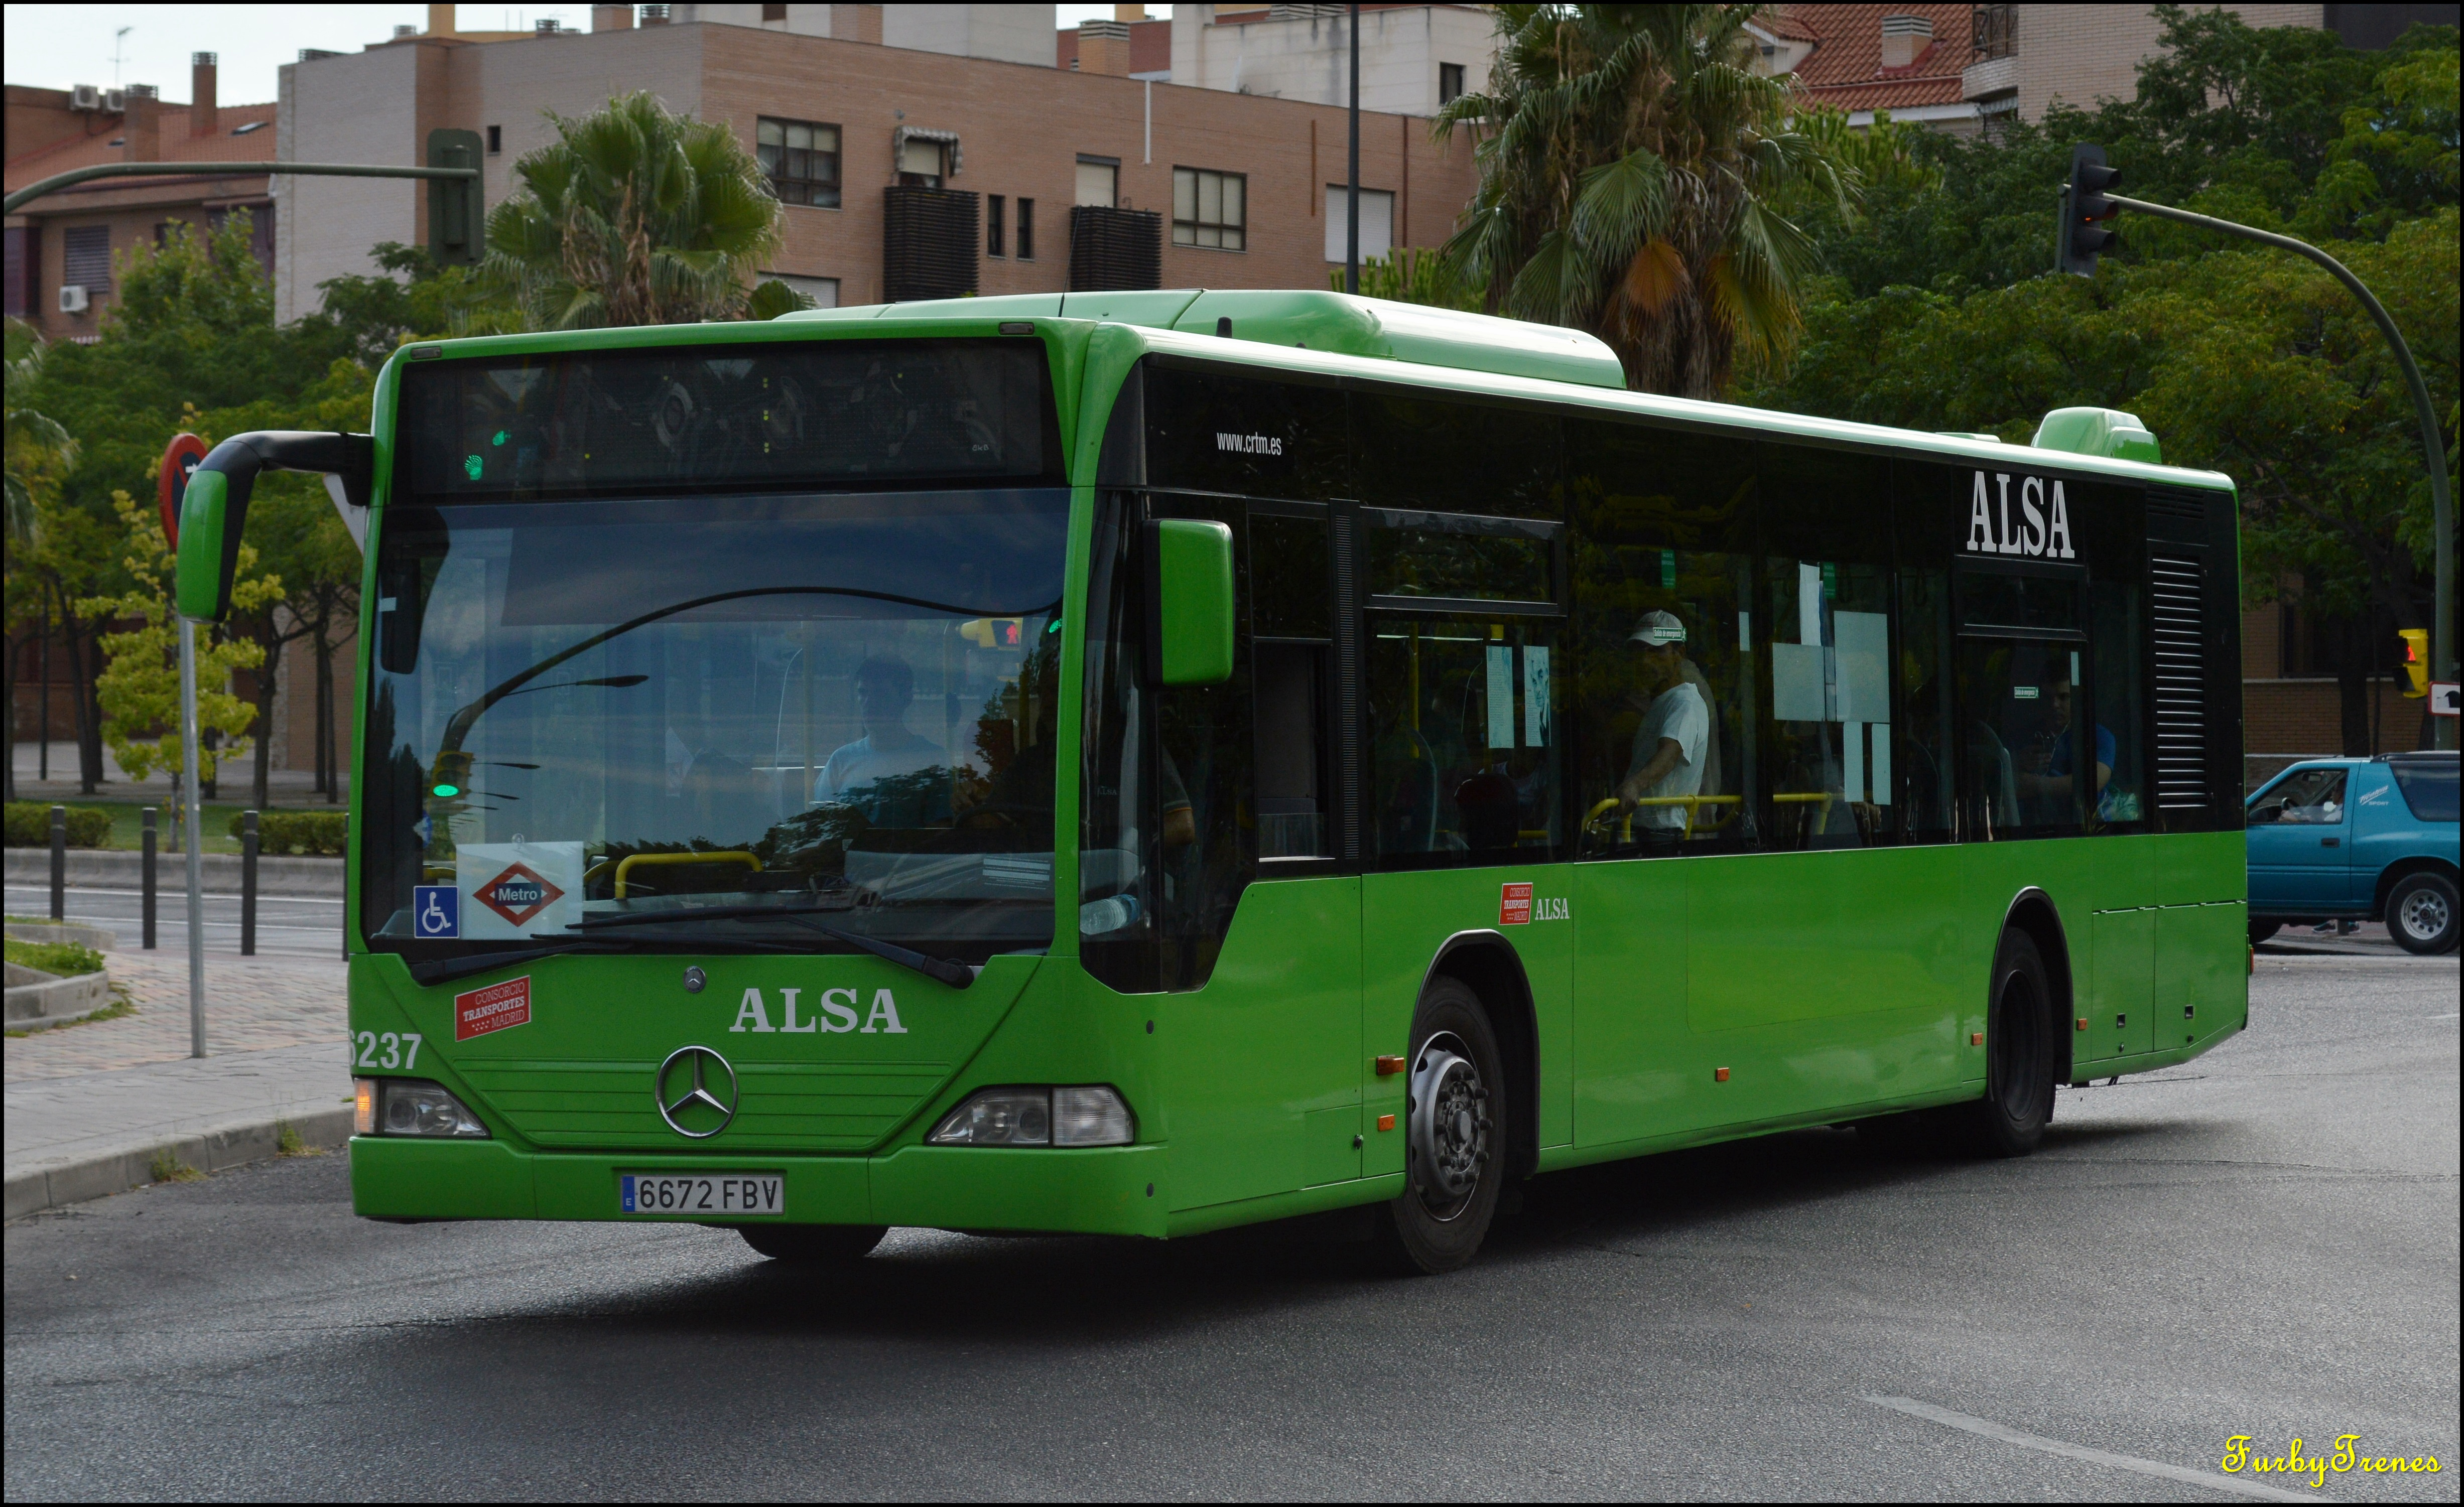 Empresa ALSA - Página 5 15865632489_a0a0e7b133_o